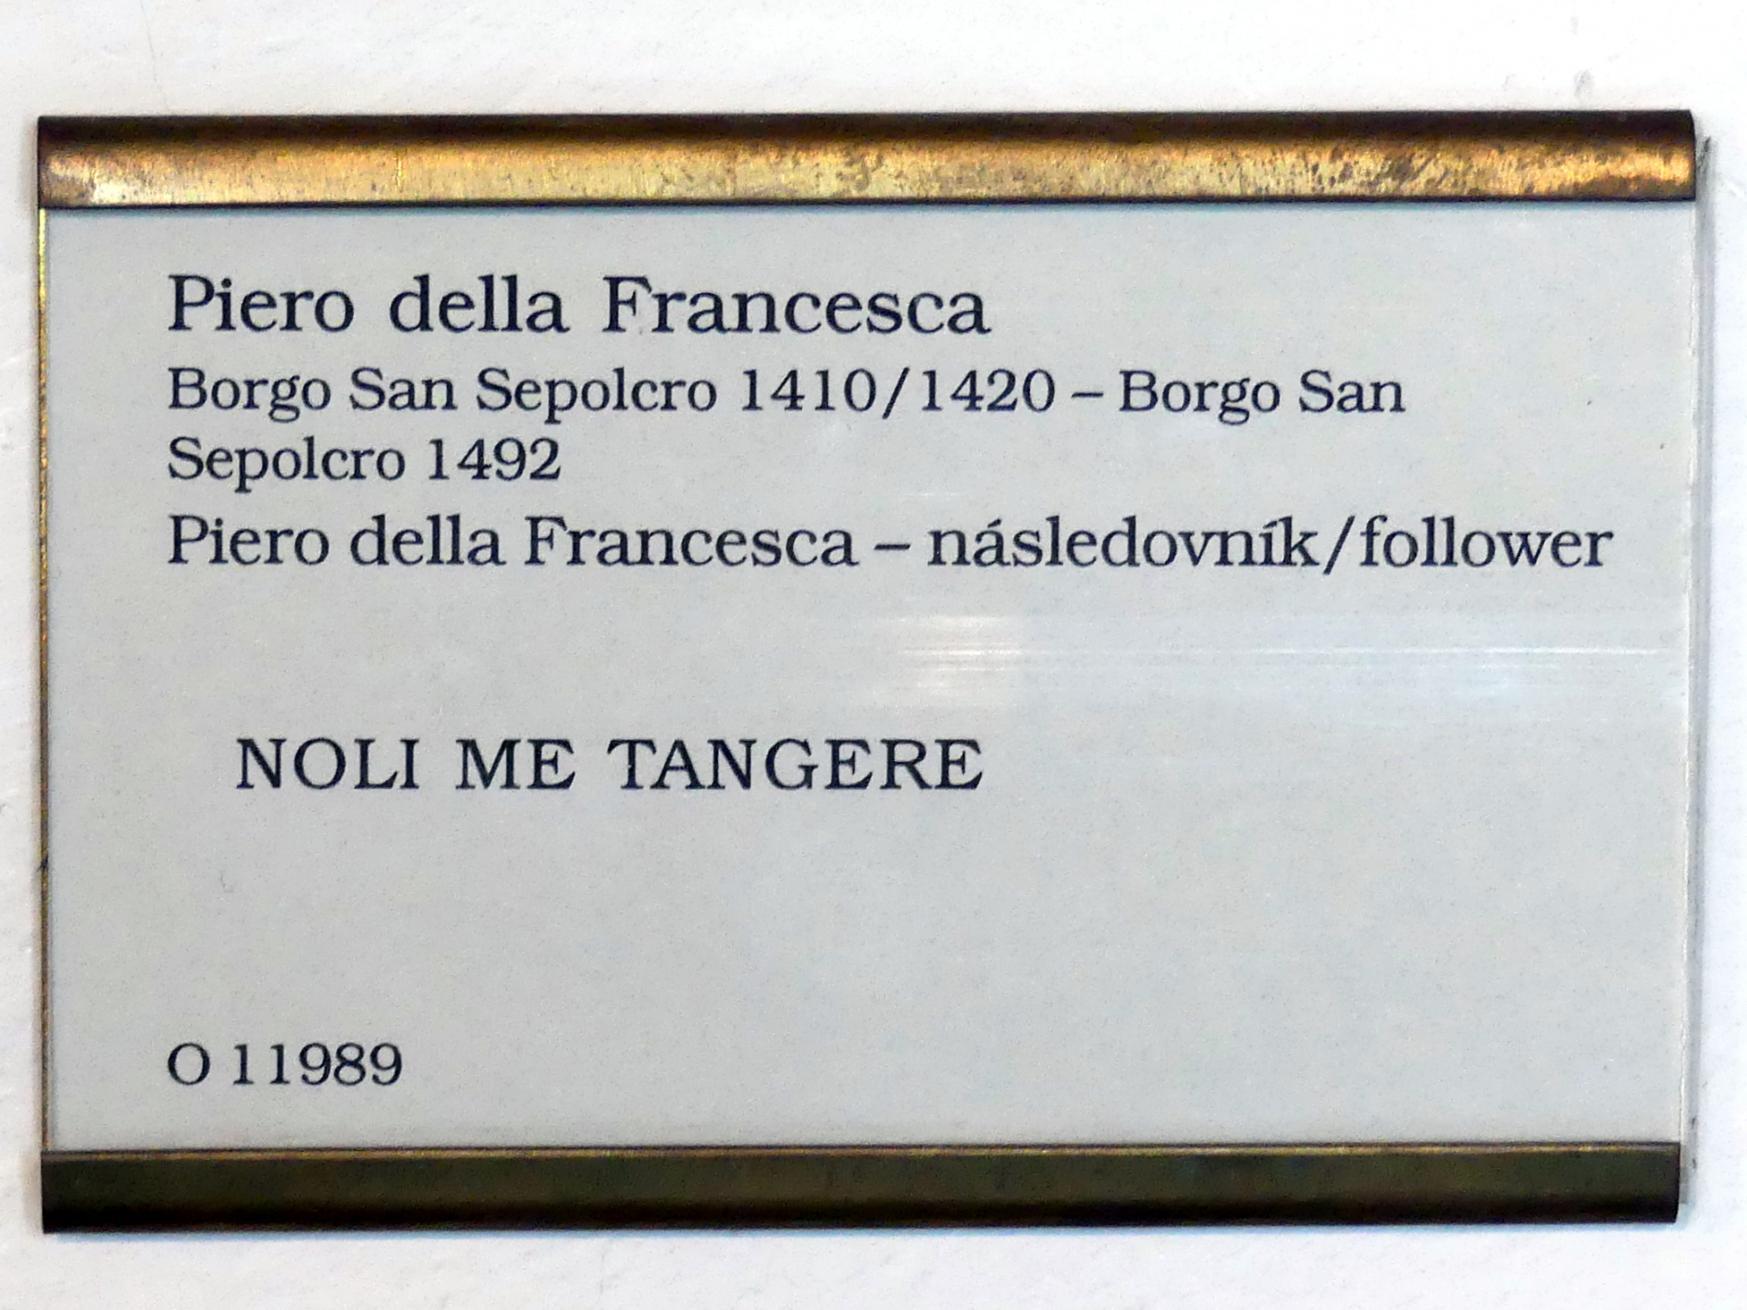 Piero della Francesca (Nachfolger): Noli me tangere, Undatiert, Bild 2/2